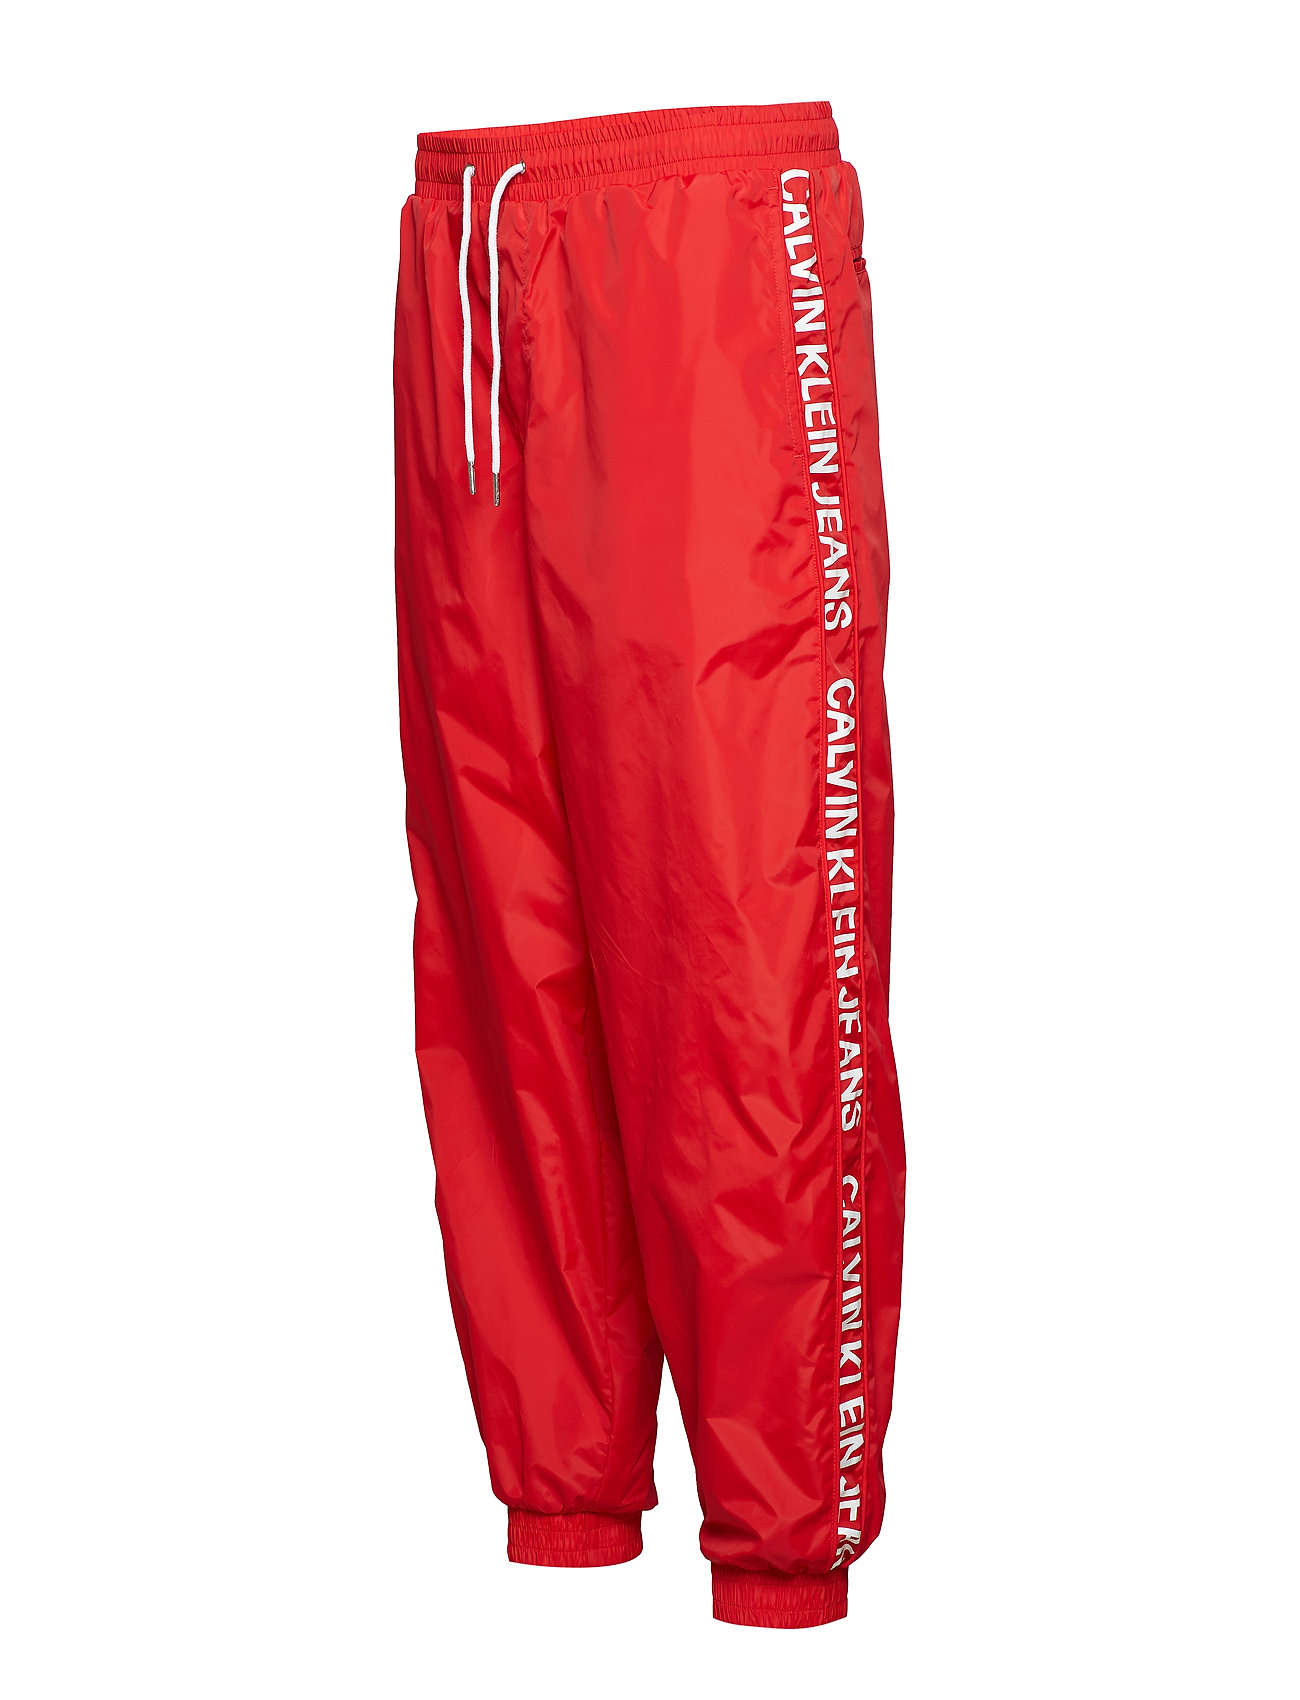 Nylon Pantsracing Jogging Jeans RedCalvin Klein cL5Ajq34SR